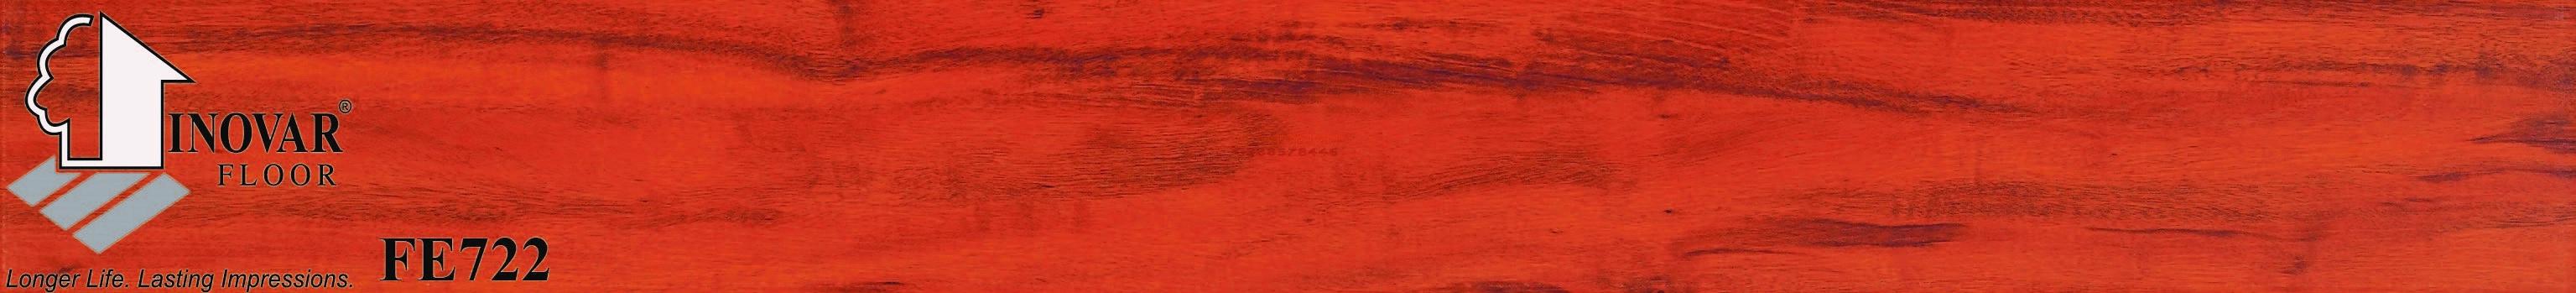 Sàn gỗ Inovar FE 722